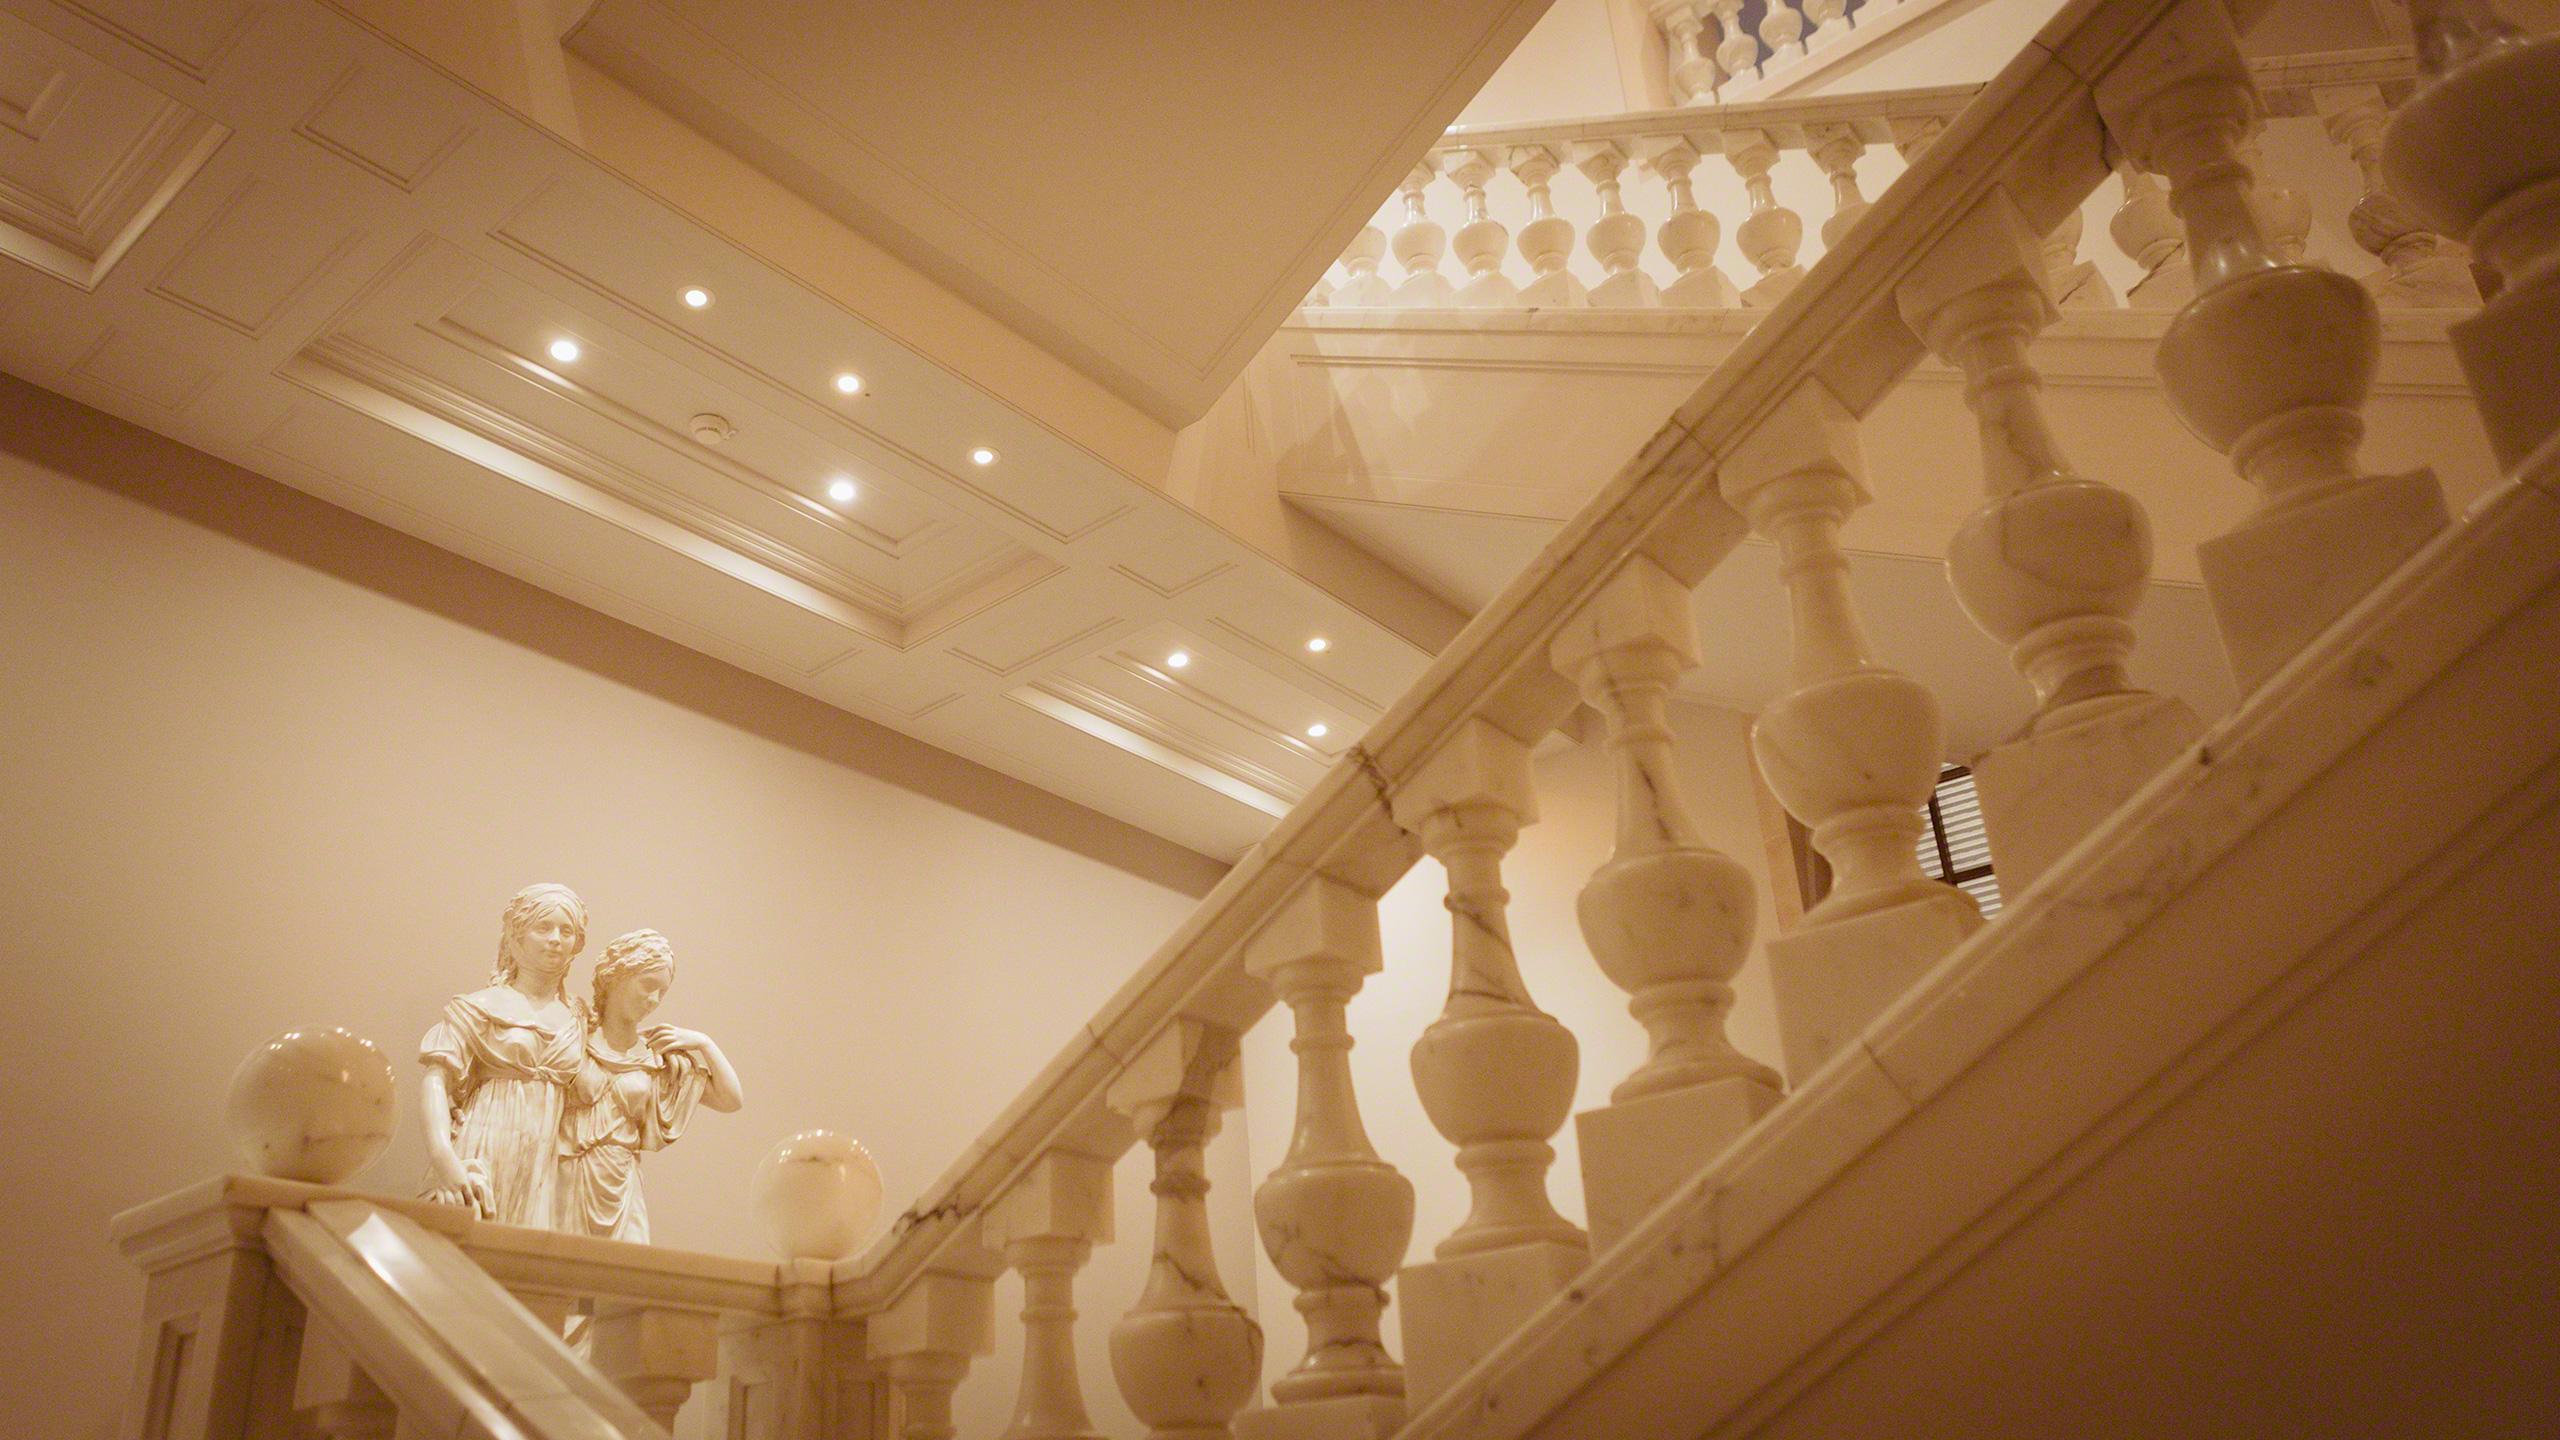 Luxushotel Adlon Kempinski Treppenhaus